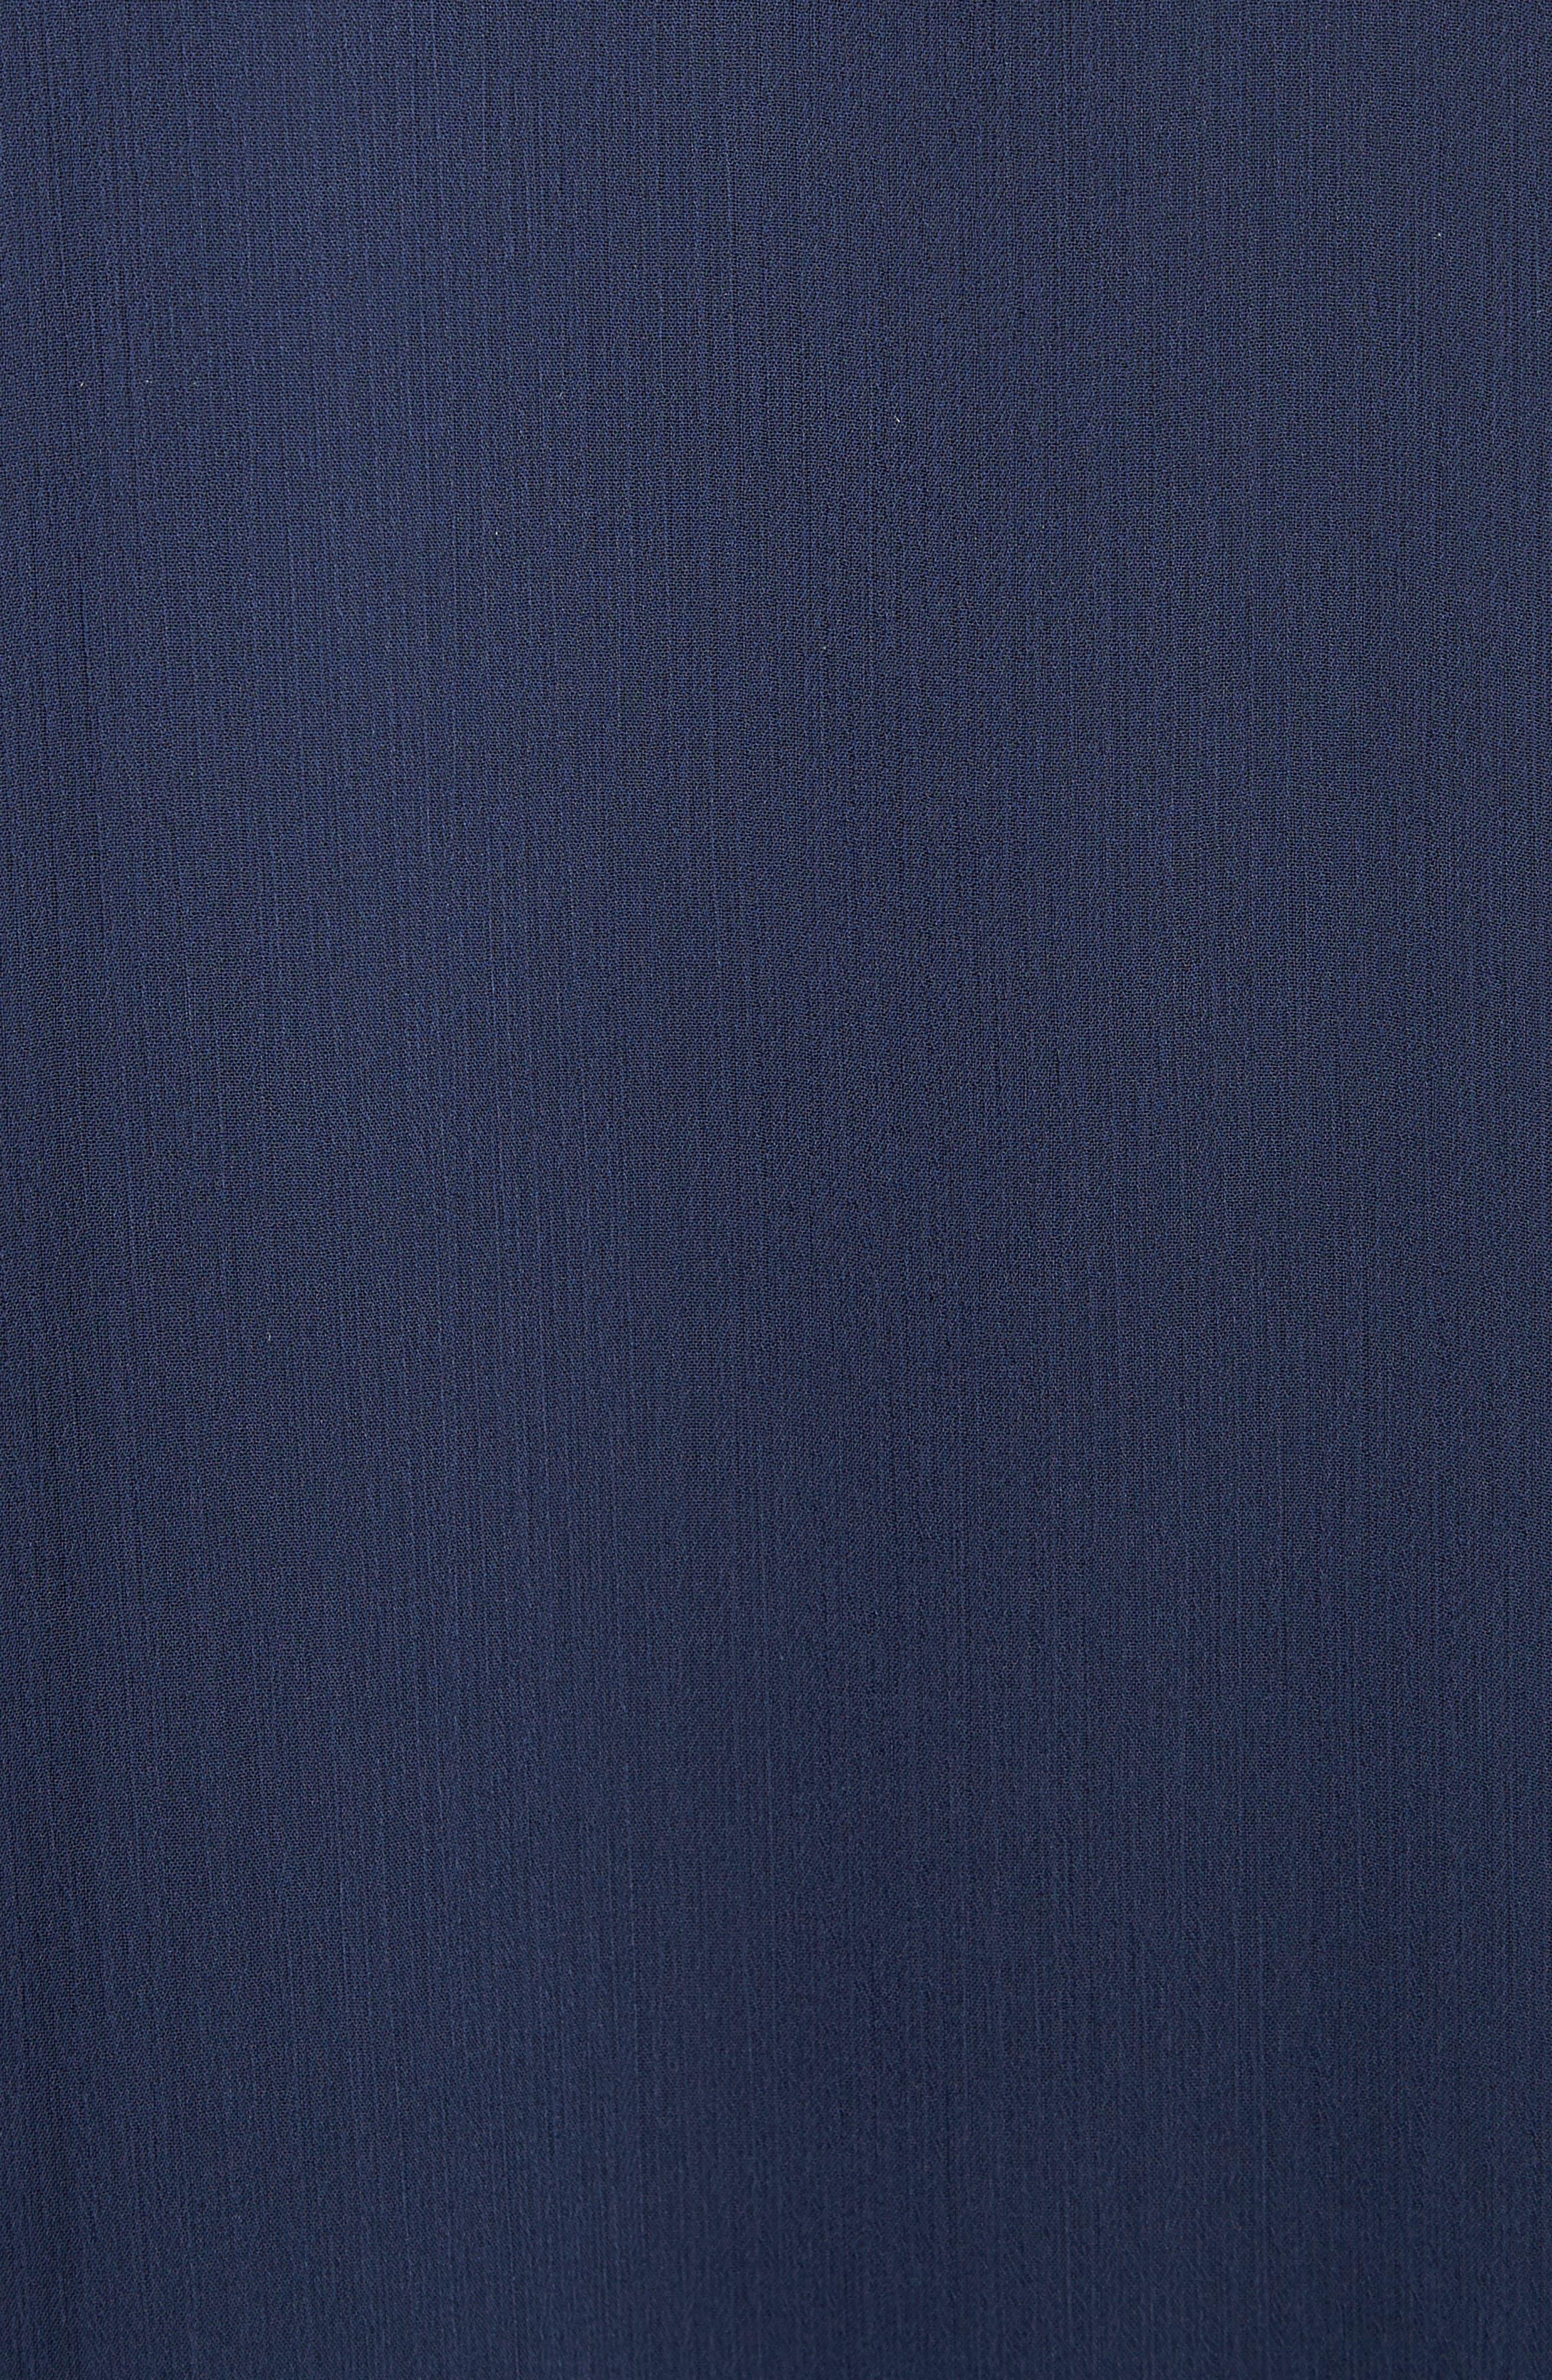 Zoey Drop Waist Dress,                             Alternate thumbnail 5, color,                             Sapphire